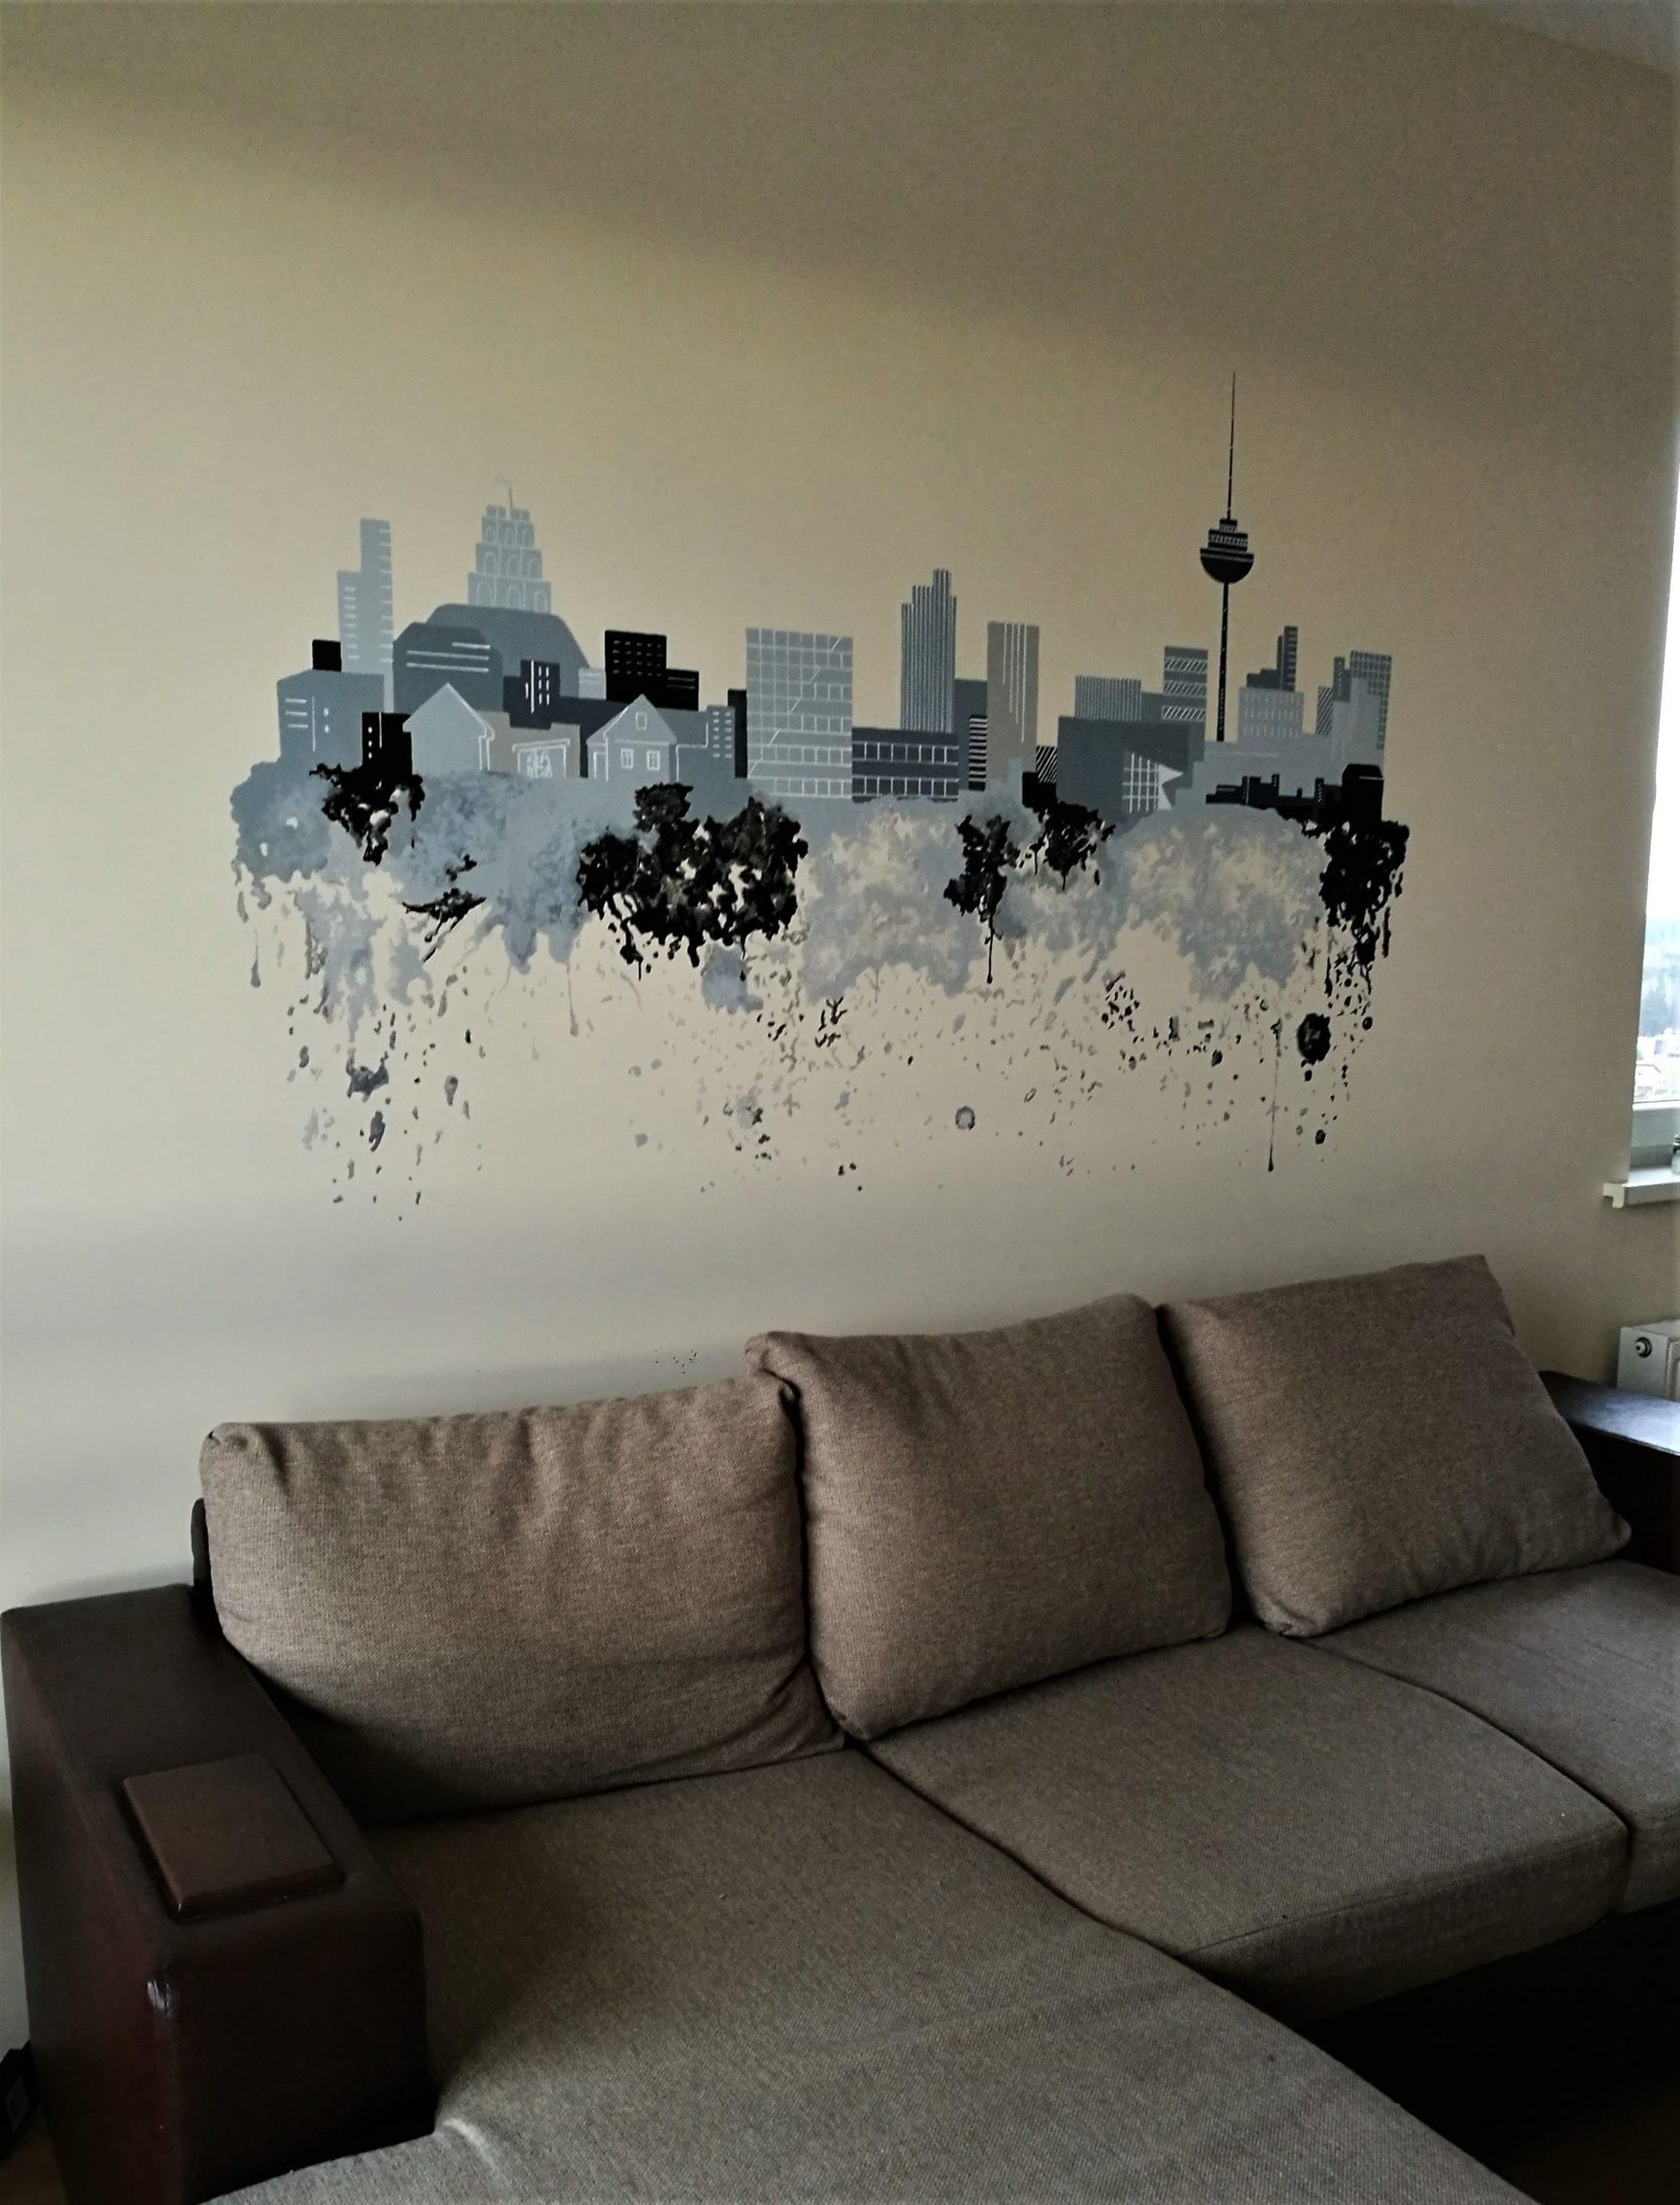 menine-kuryba-sienu-dekoravimas-ivairus-interjerai (17)